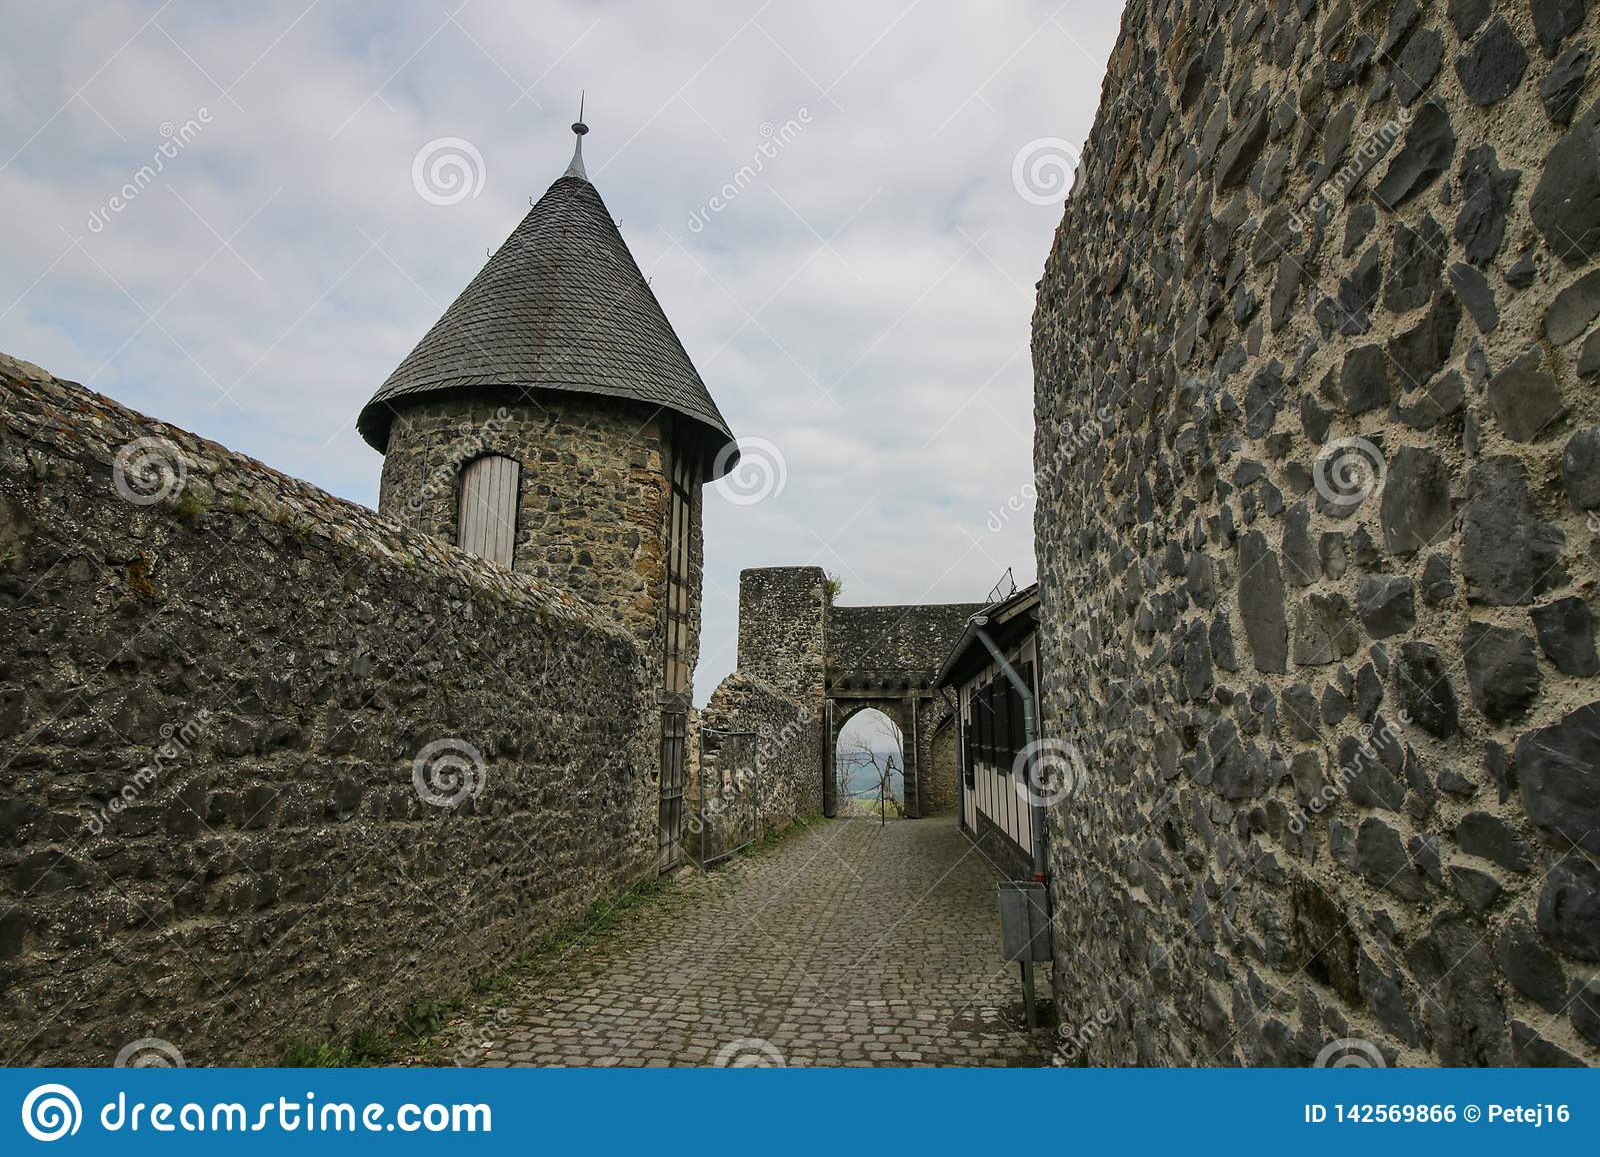 Bewolkte hemel over middeleeuwse kasteelruïnes